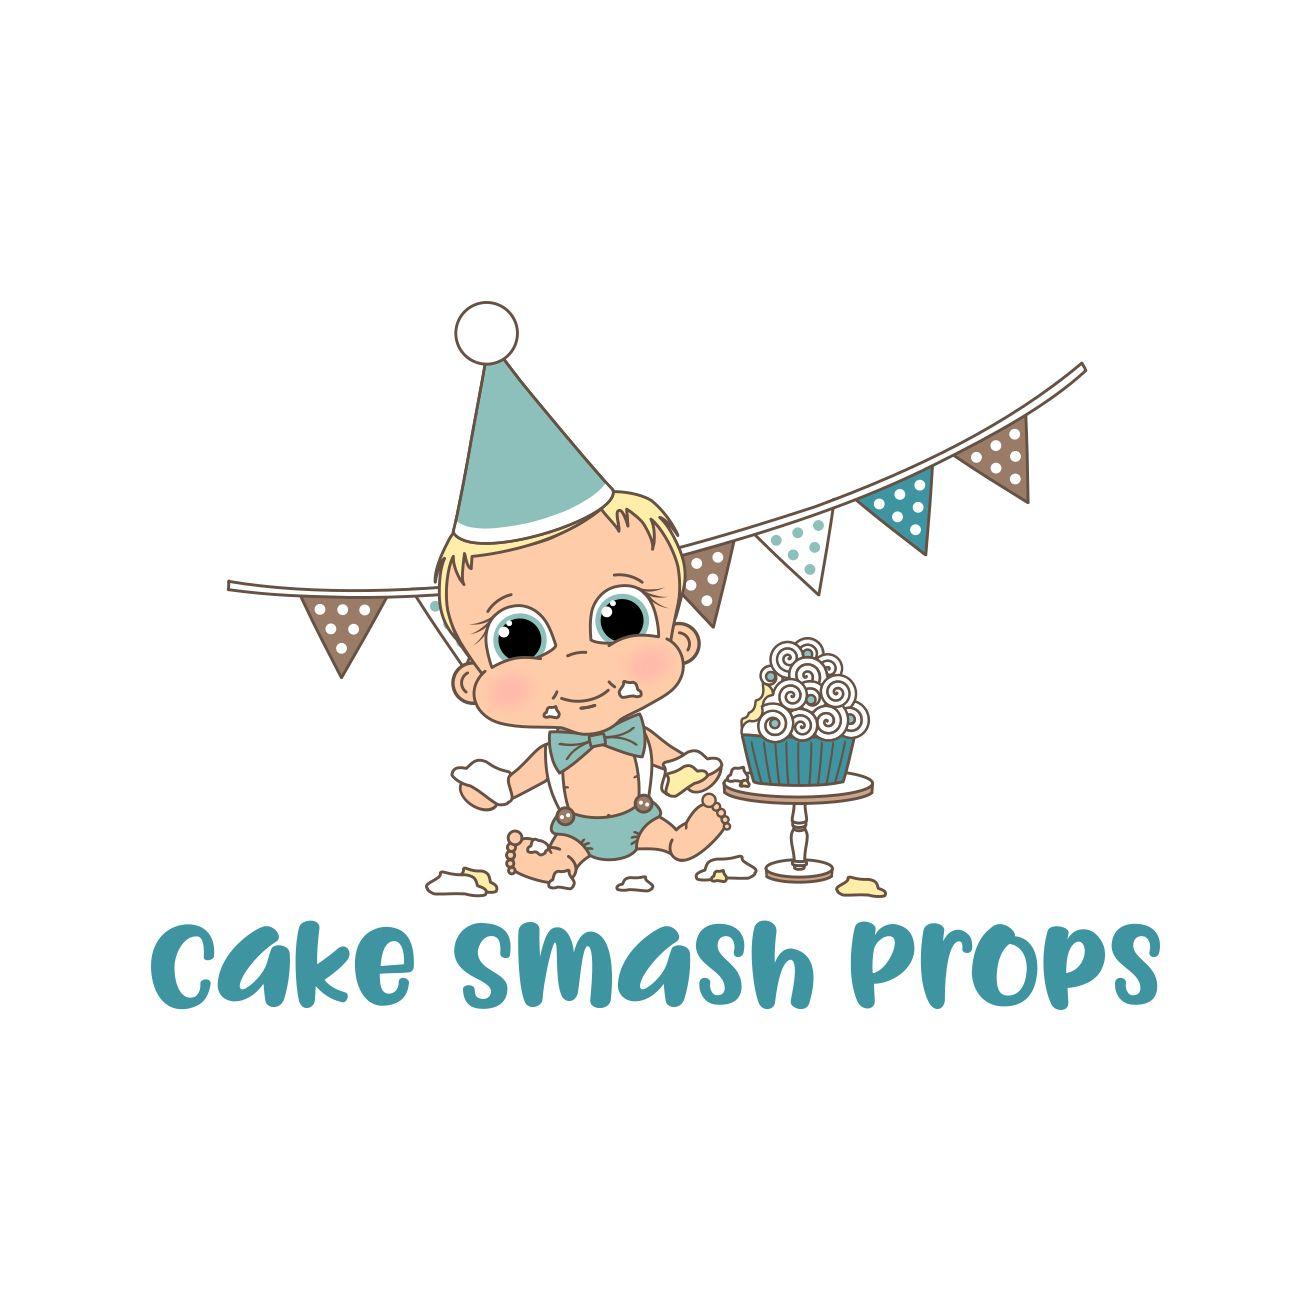 Cake Smash Props